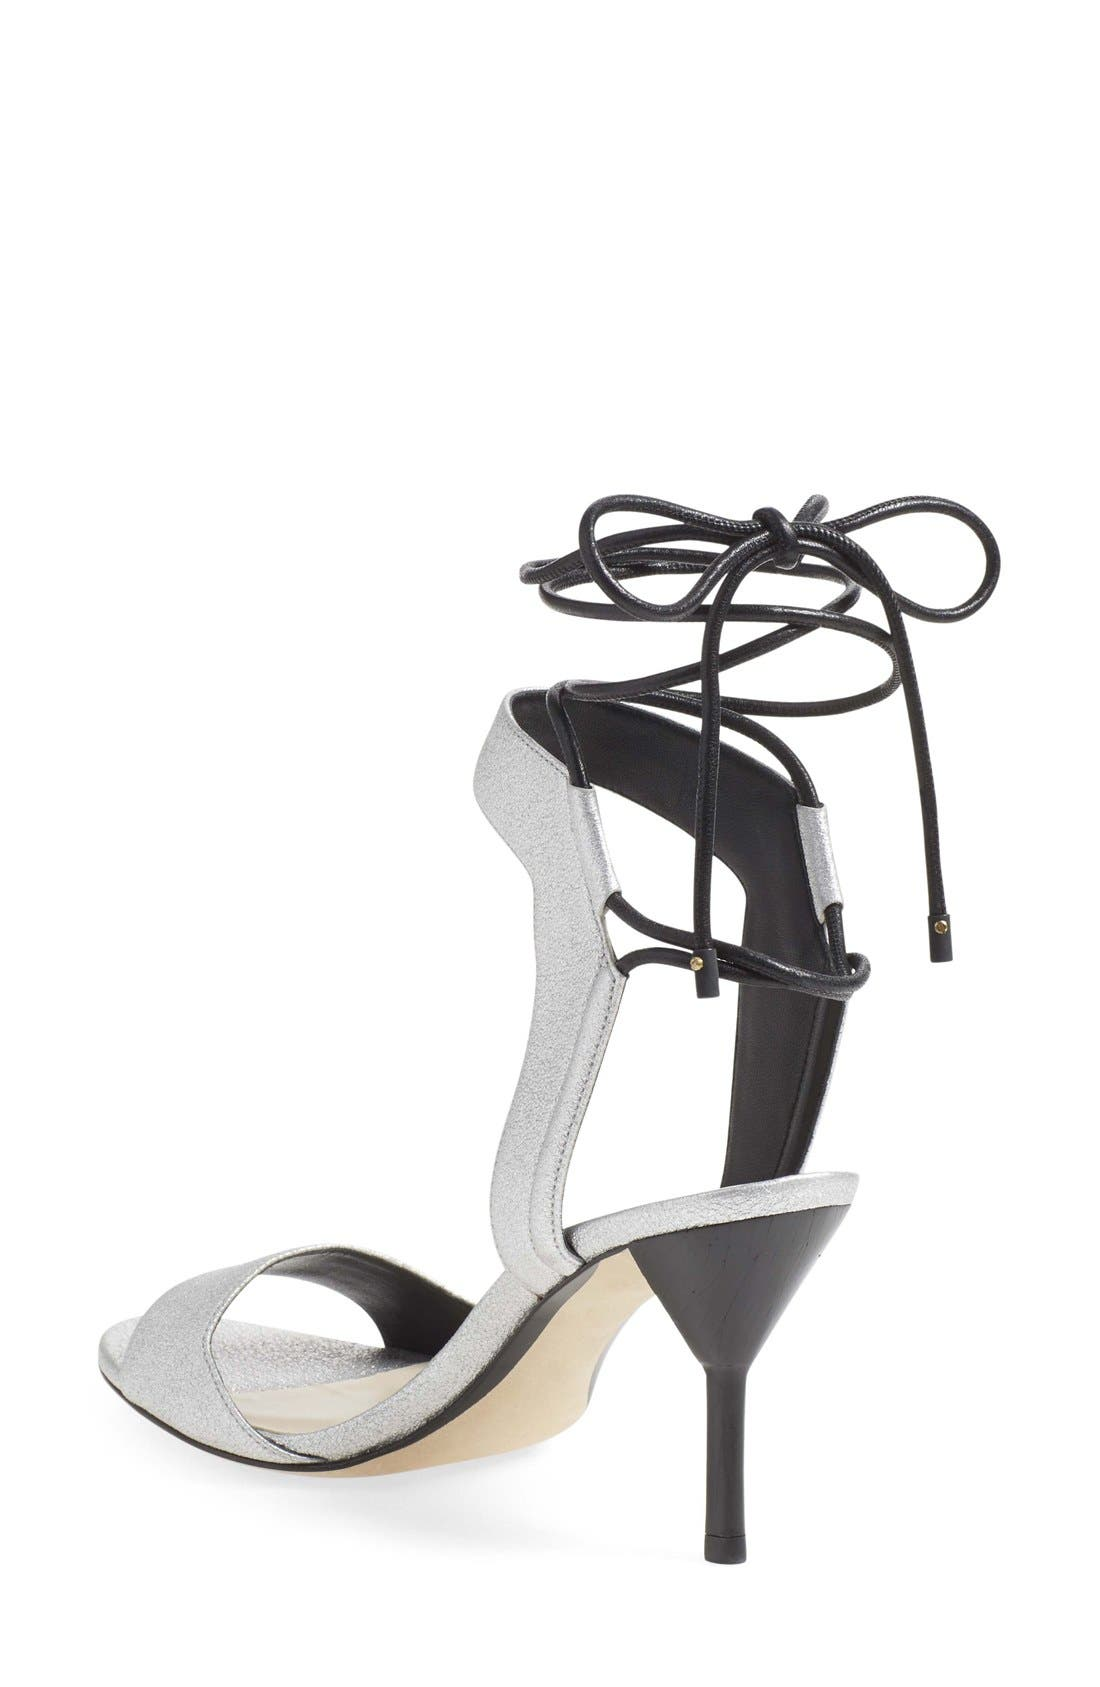 Alternate Image 2  - 3.1 Phillip Lim 'Martini' Wraparound Ankle Strap Sandal (Women)